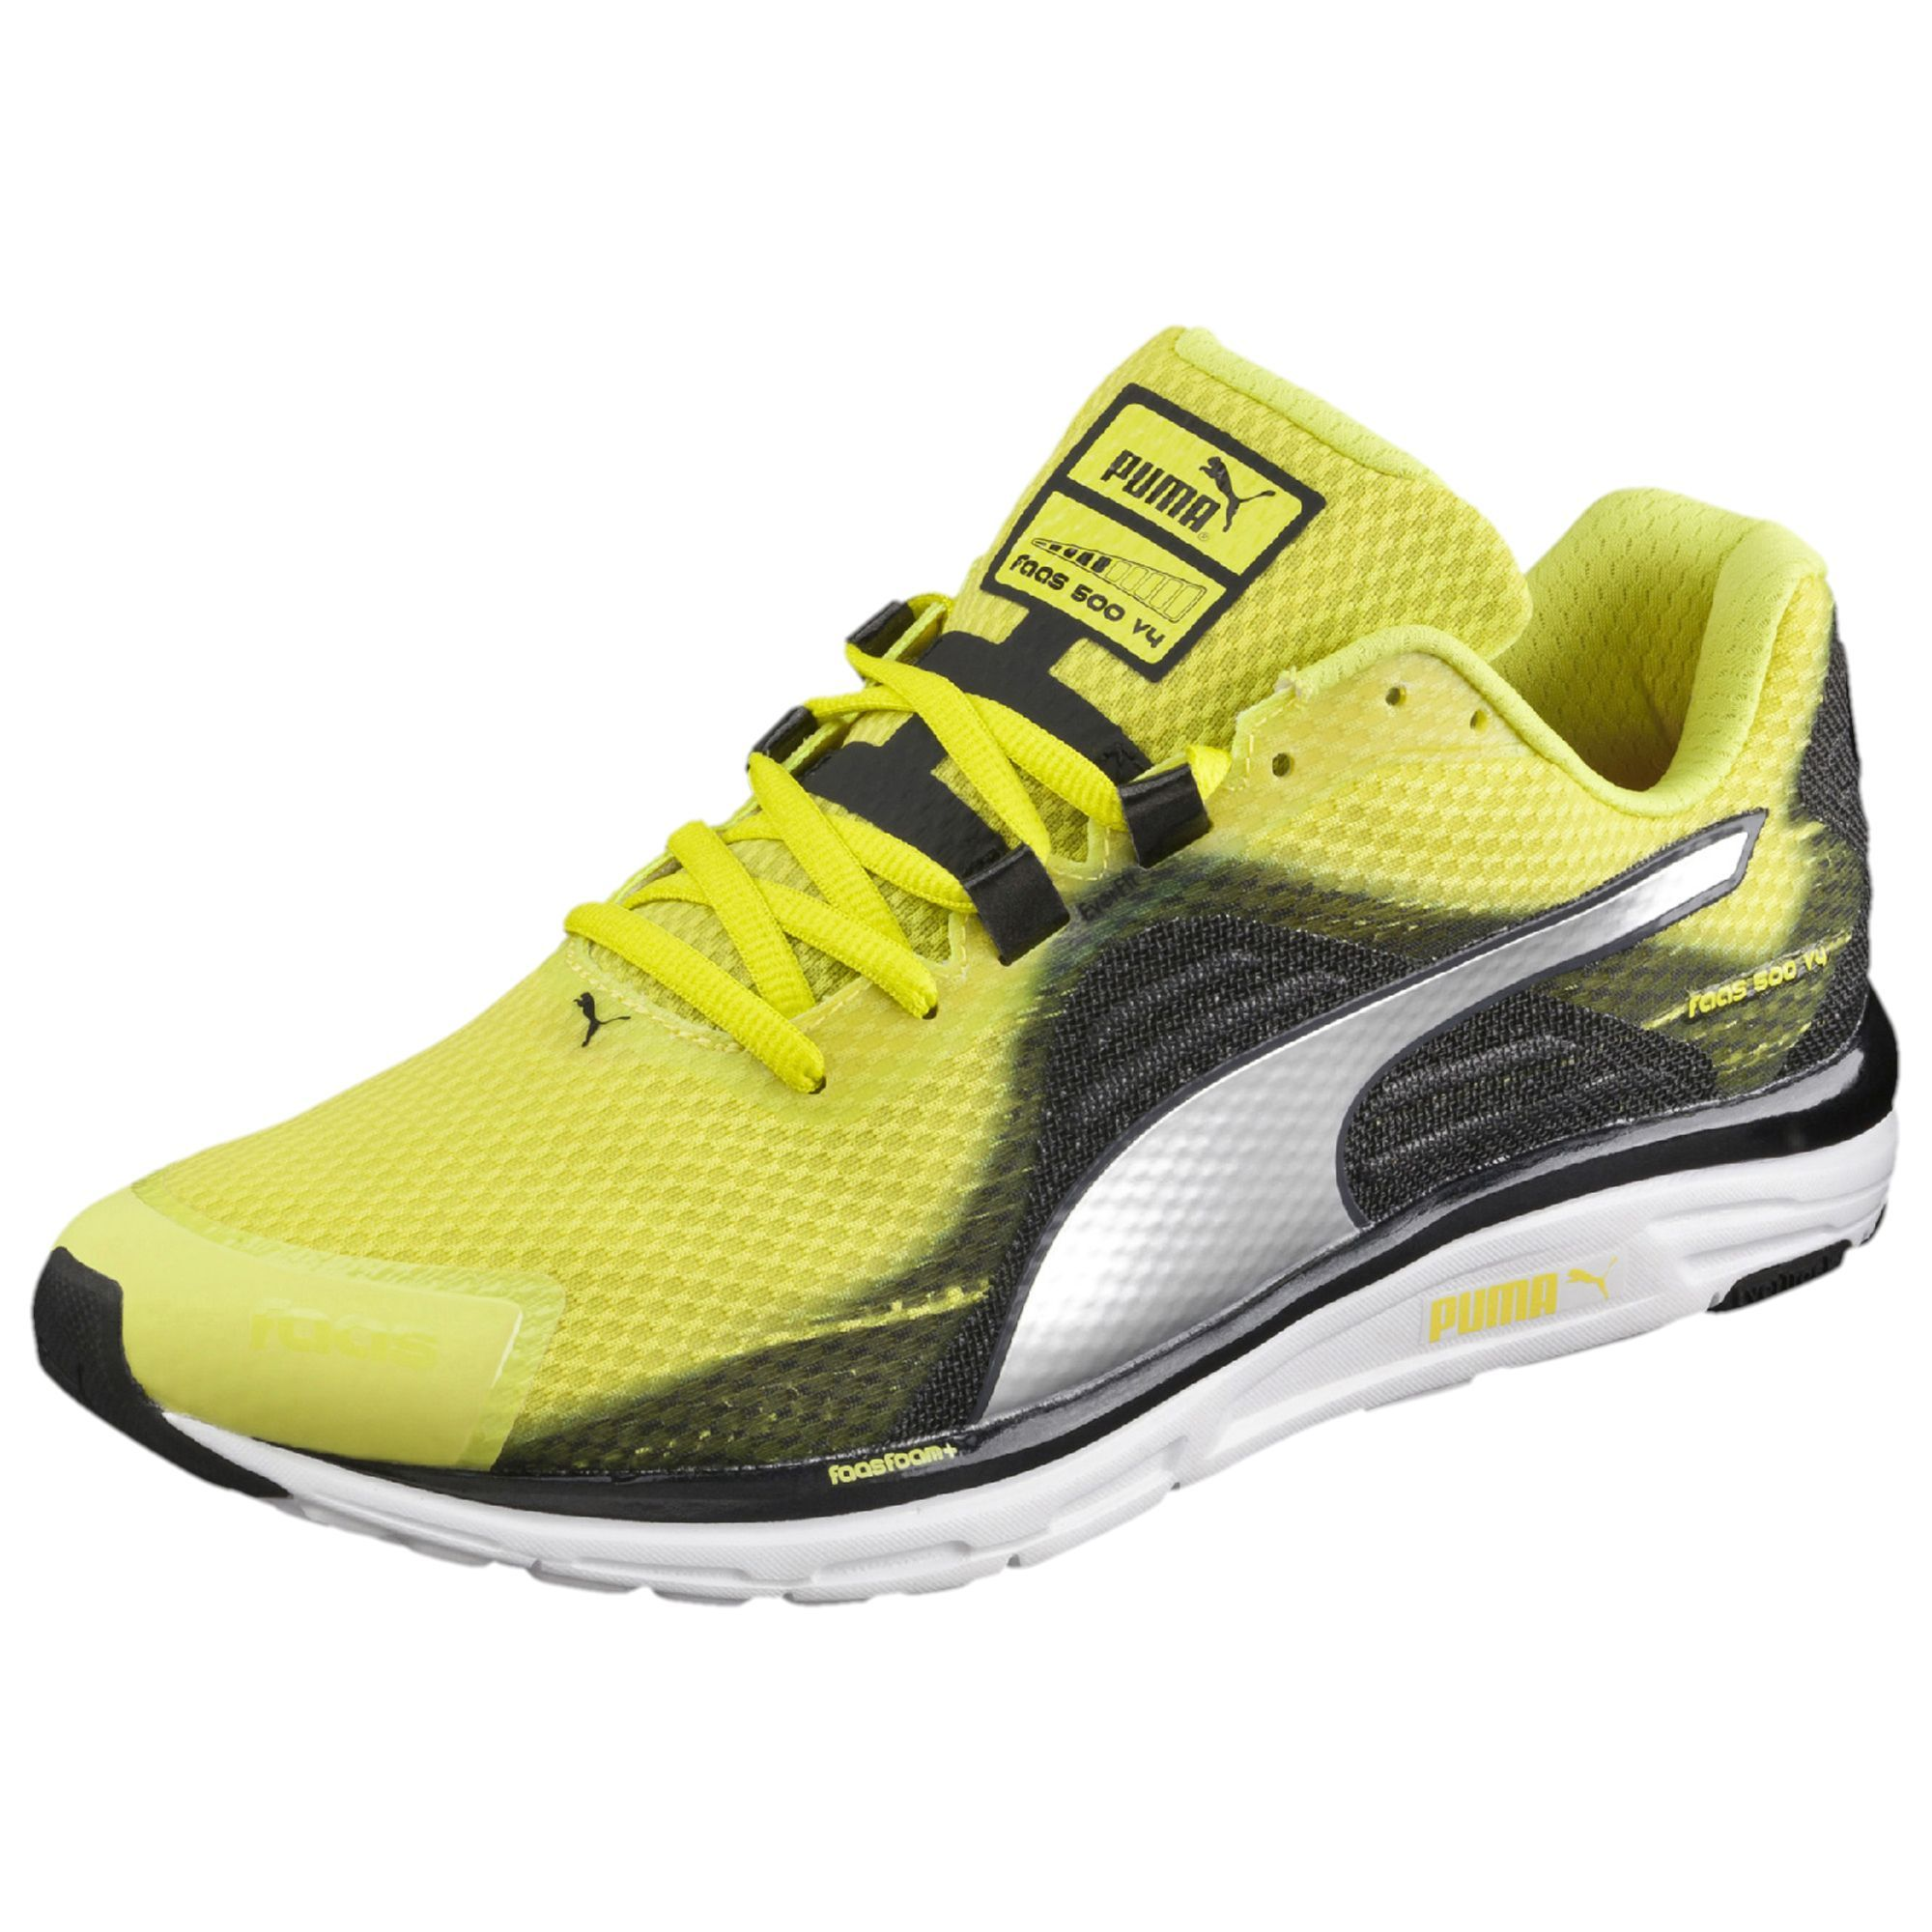 Snug Running Shoes